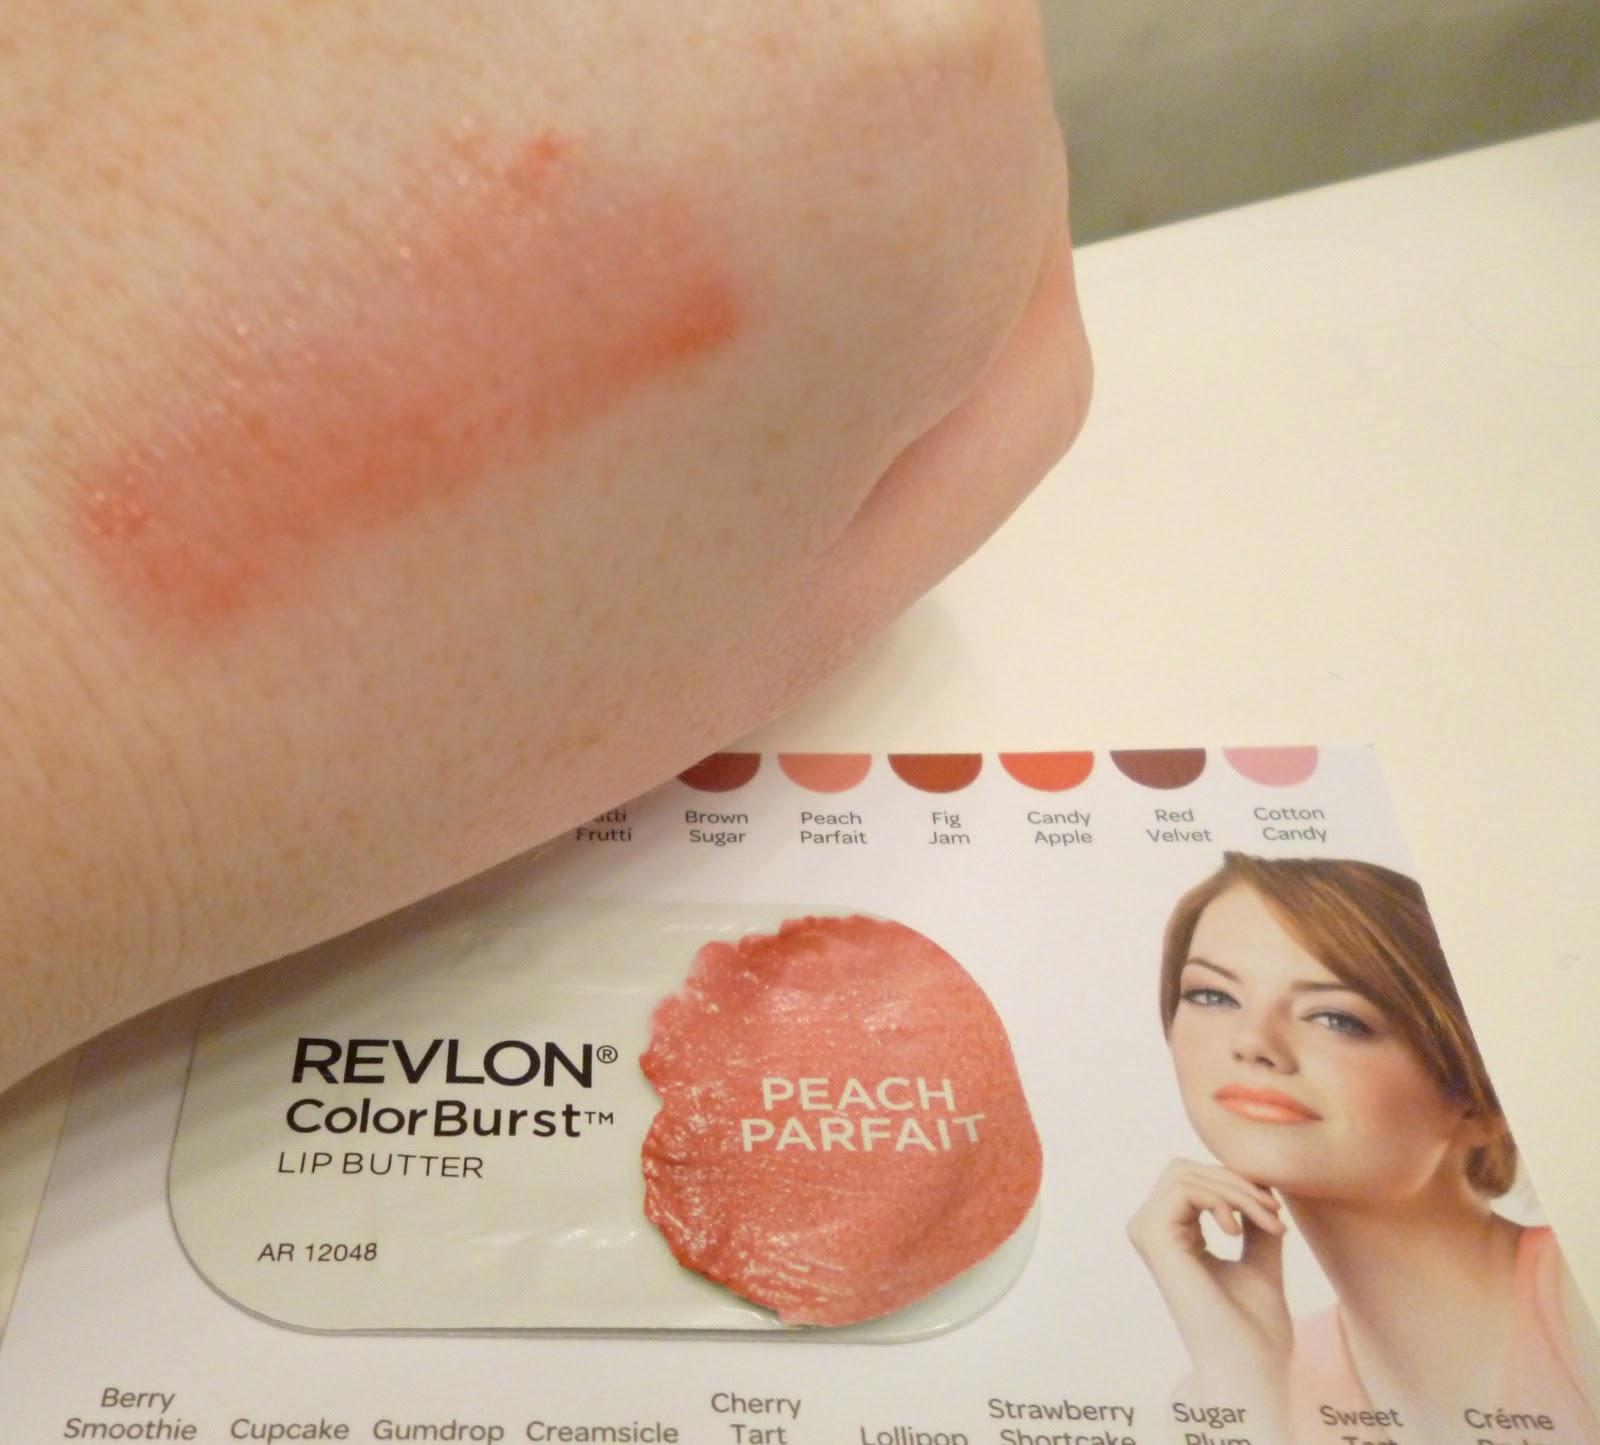 http://2.bp.blogspot.com/-n3pFu5NtFl0/T9d7cLs6OzI/AAAAAAAACJE/flRHJHP5EG8/s1600/emma+stone+revlon+colorburst+lip+butter+sample+peach+parfait+swatch+beuaty+product+review.JPG